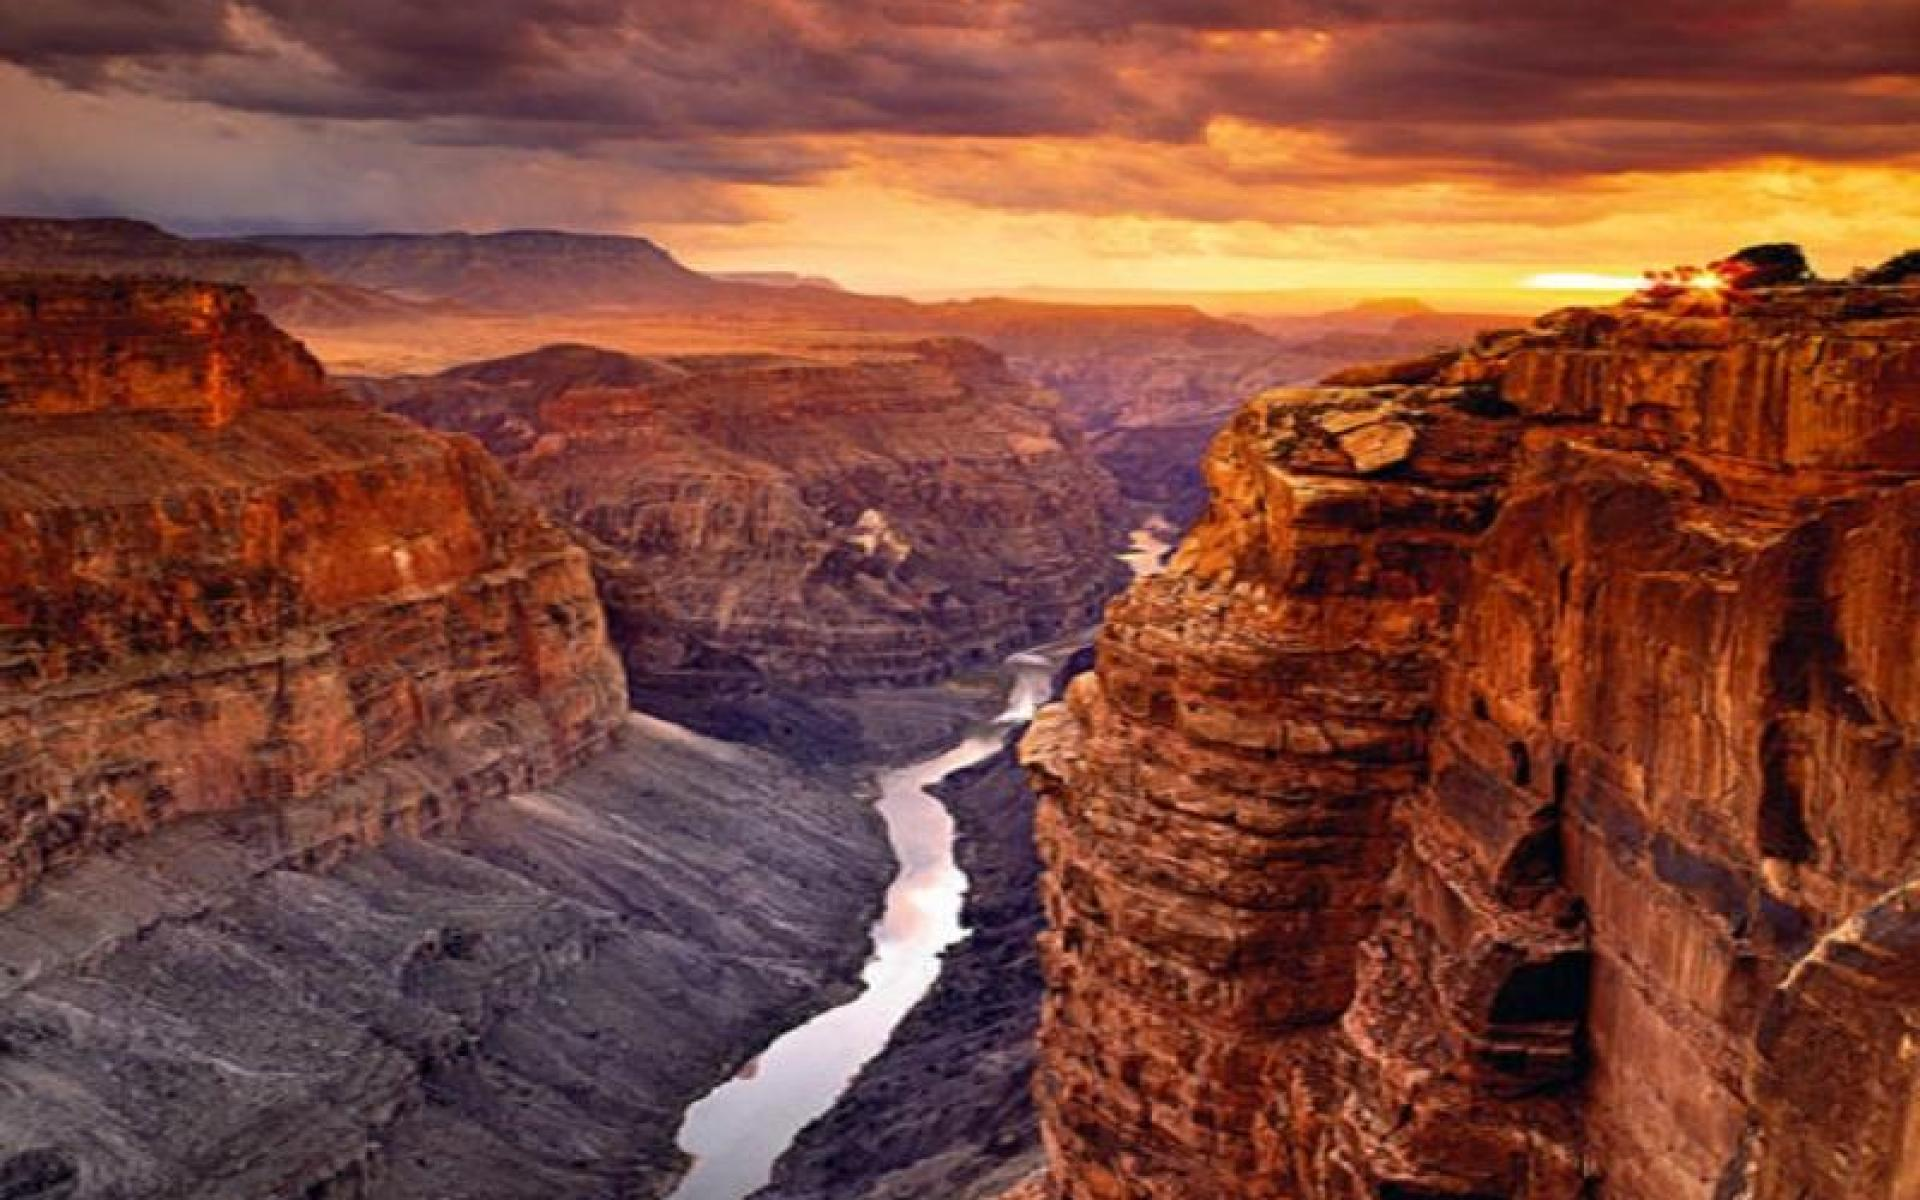 download HEAVEN ON EARTH GRAND CANYON WALLPAPER 71017 HD 1920x1200